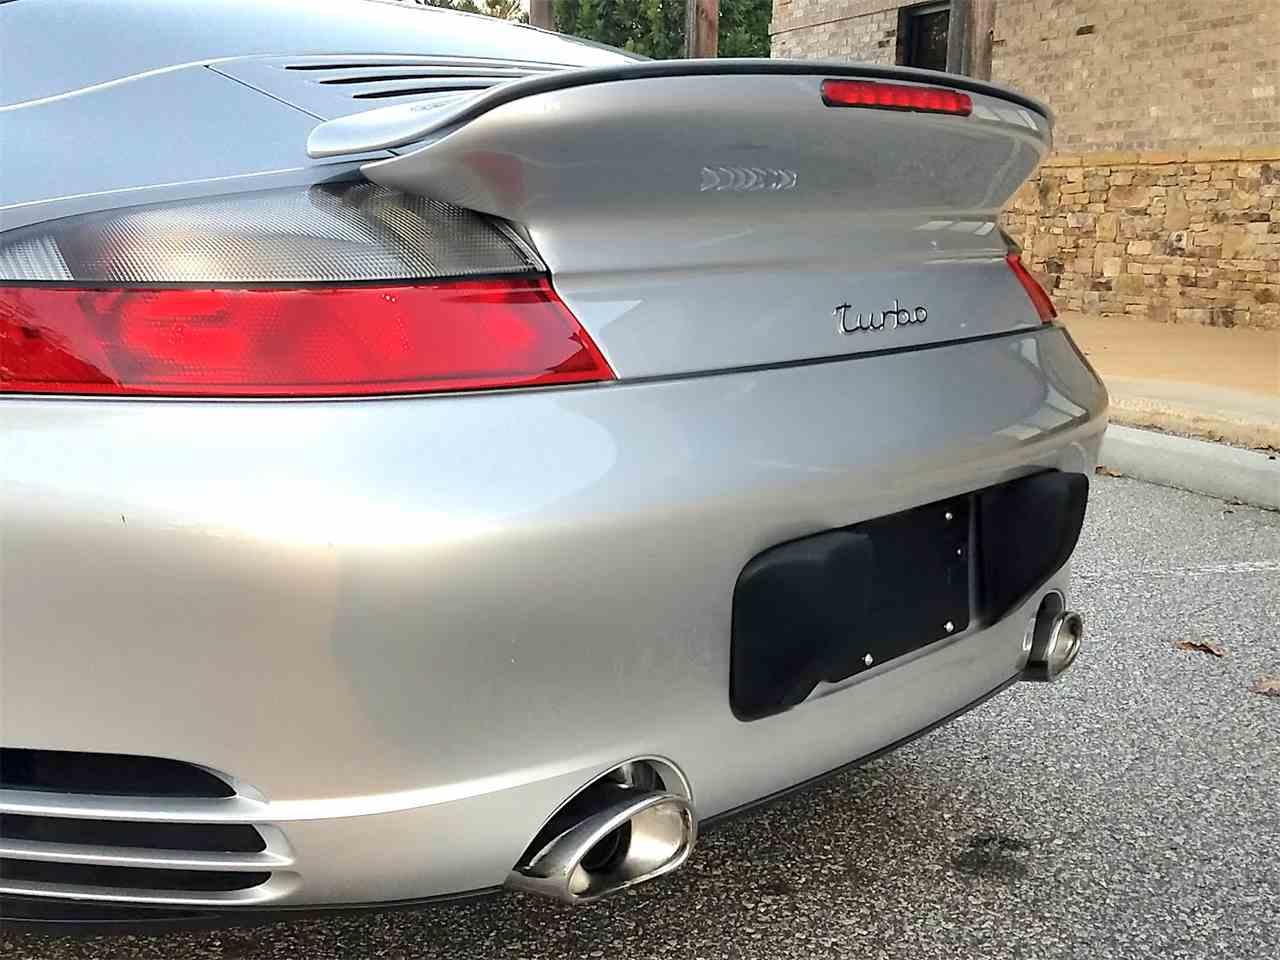 Large Picture of '04 Porsche 911 Carrera Turbo - $55,000.00 - MCDK